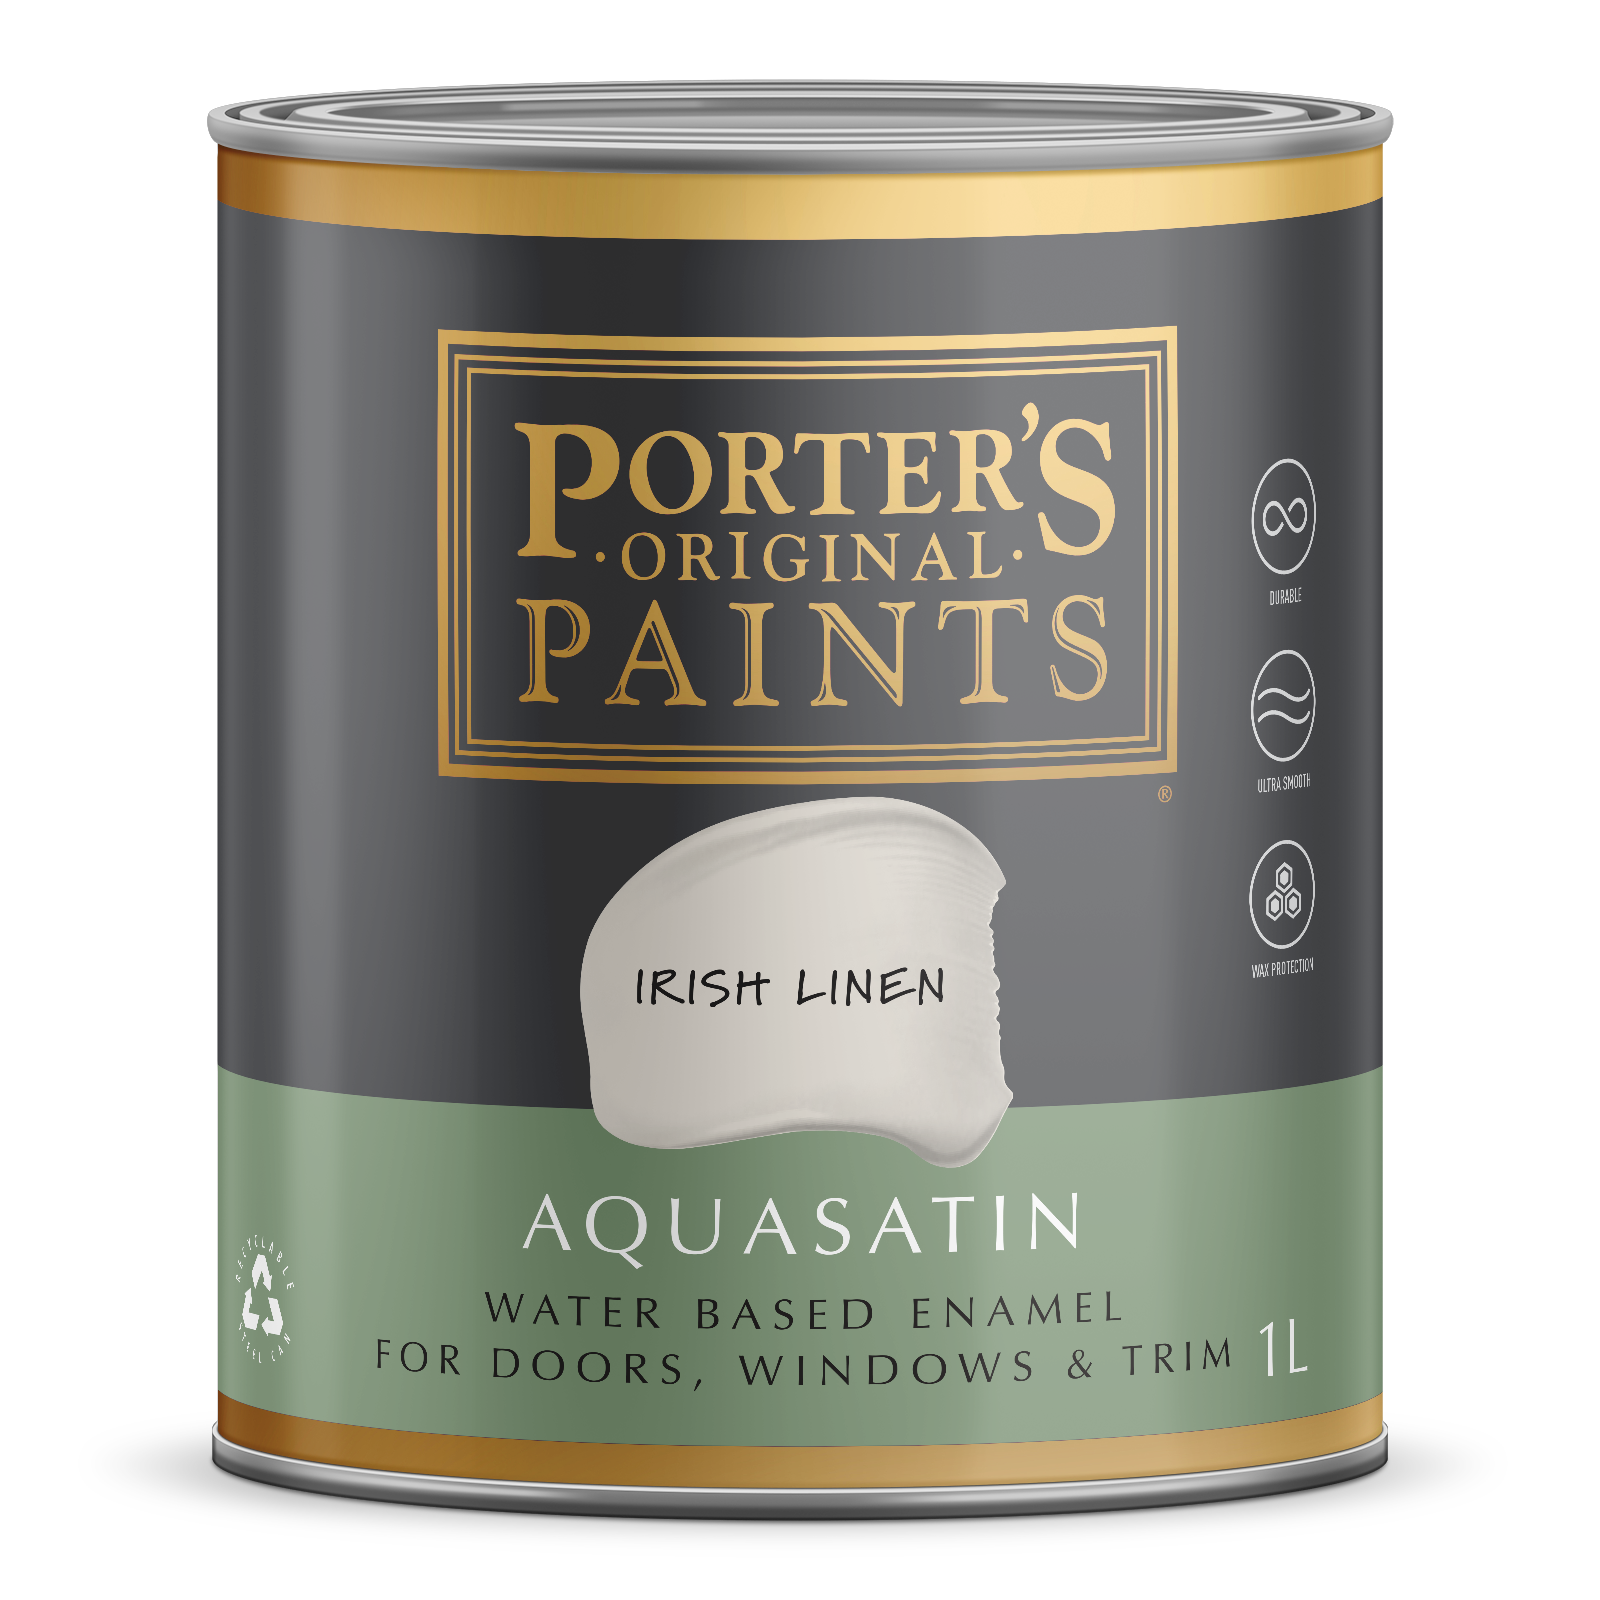 Porter's 1L Aquasatin Enamel Irish Linen Washable Paint